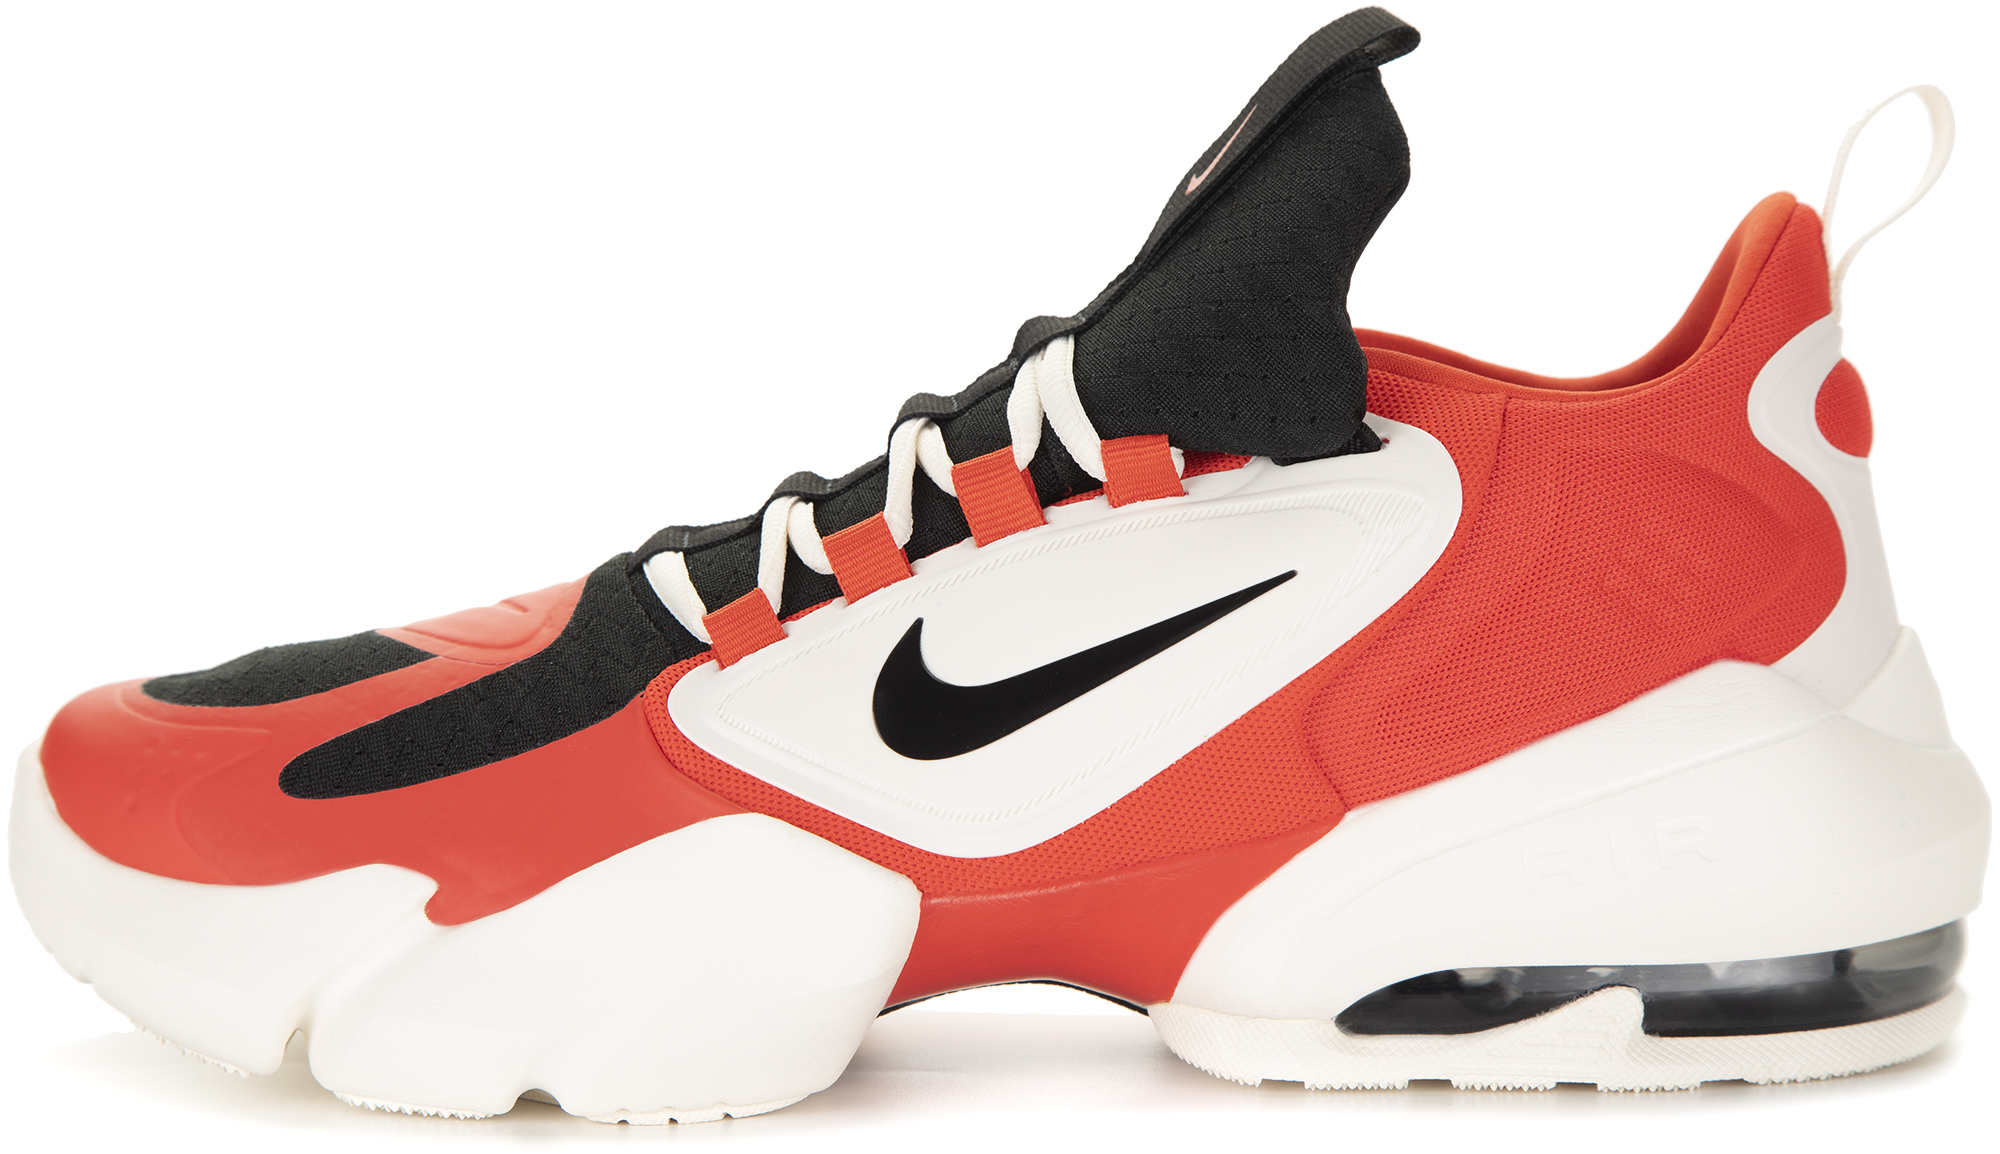 Nike Кроссовки мужские Air Max Alpha Savage, размер 46,5